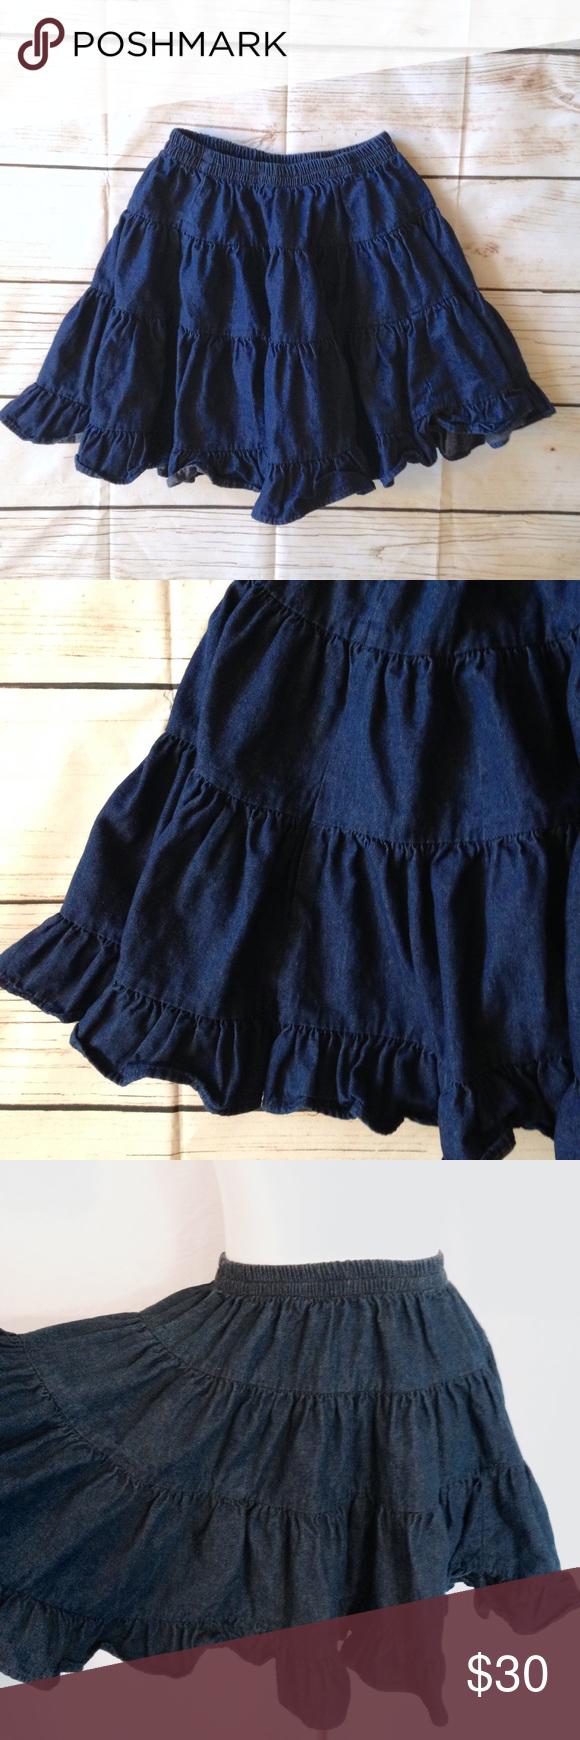 69b78844f Vintage Ruffled Denim Circle Skirt Sz M Absolutely adorable! True vintage  from the 90's. Dark denim tiered ruffle mini skirt. Elastic waistband.